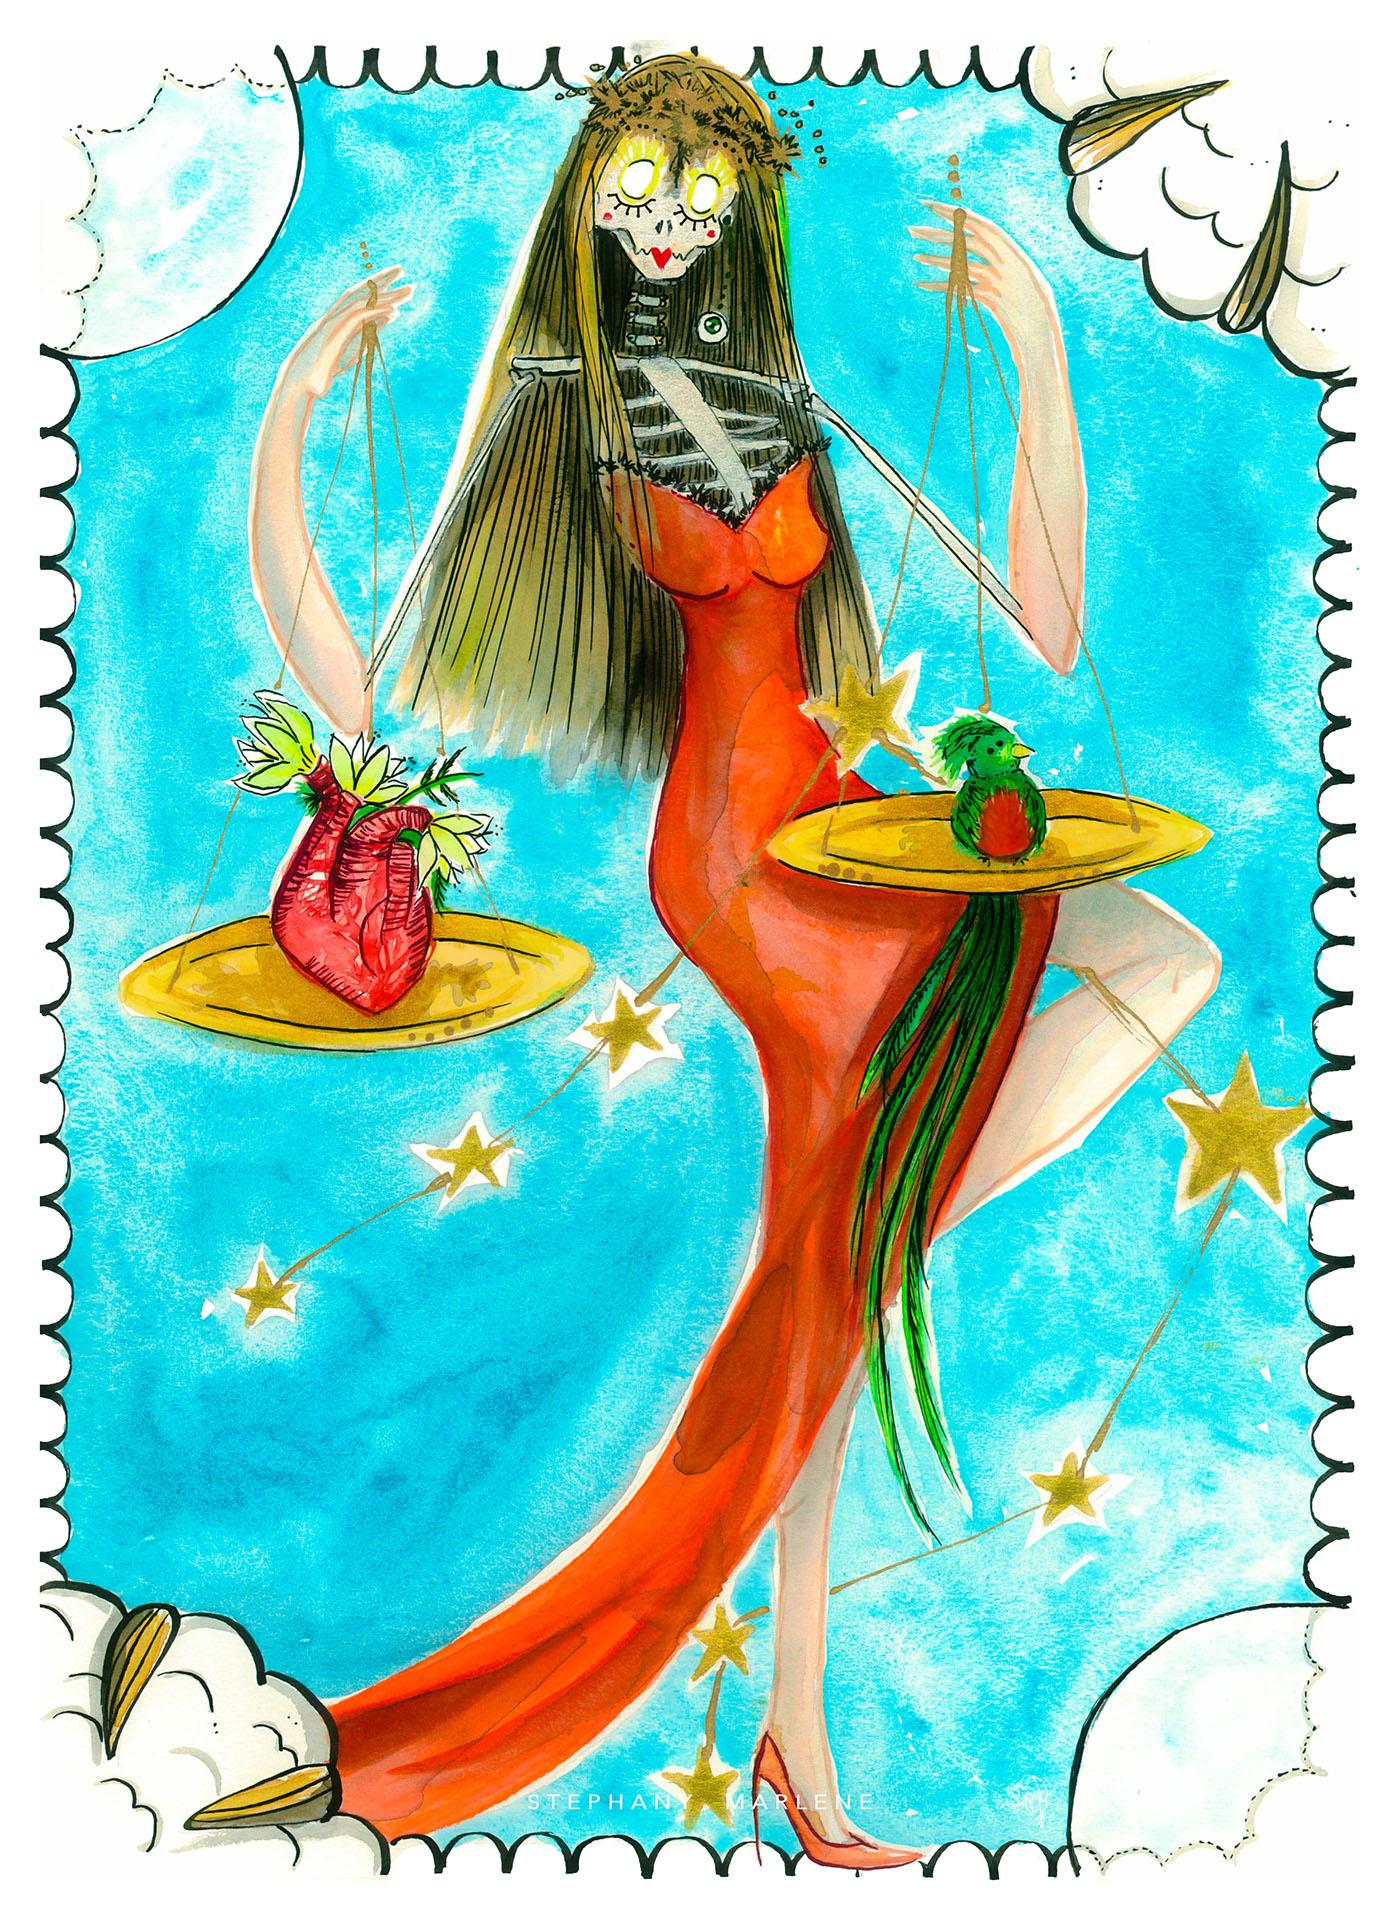 miss catrina libra Astrology zodiac art watercolor mexico stephanymarlen3 death catrina